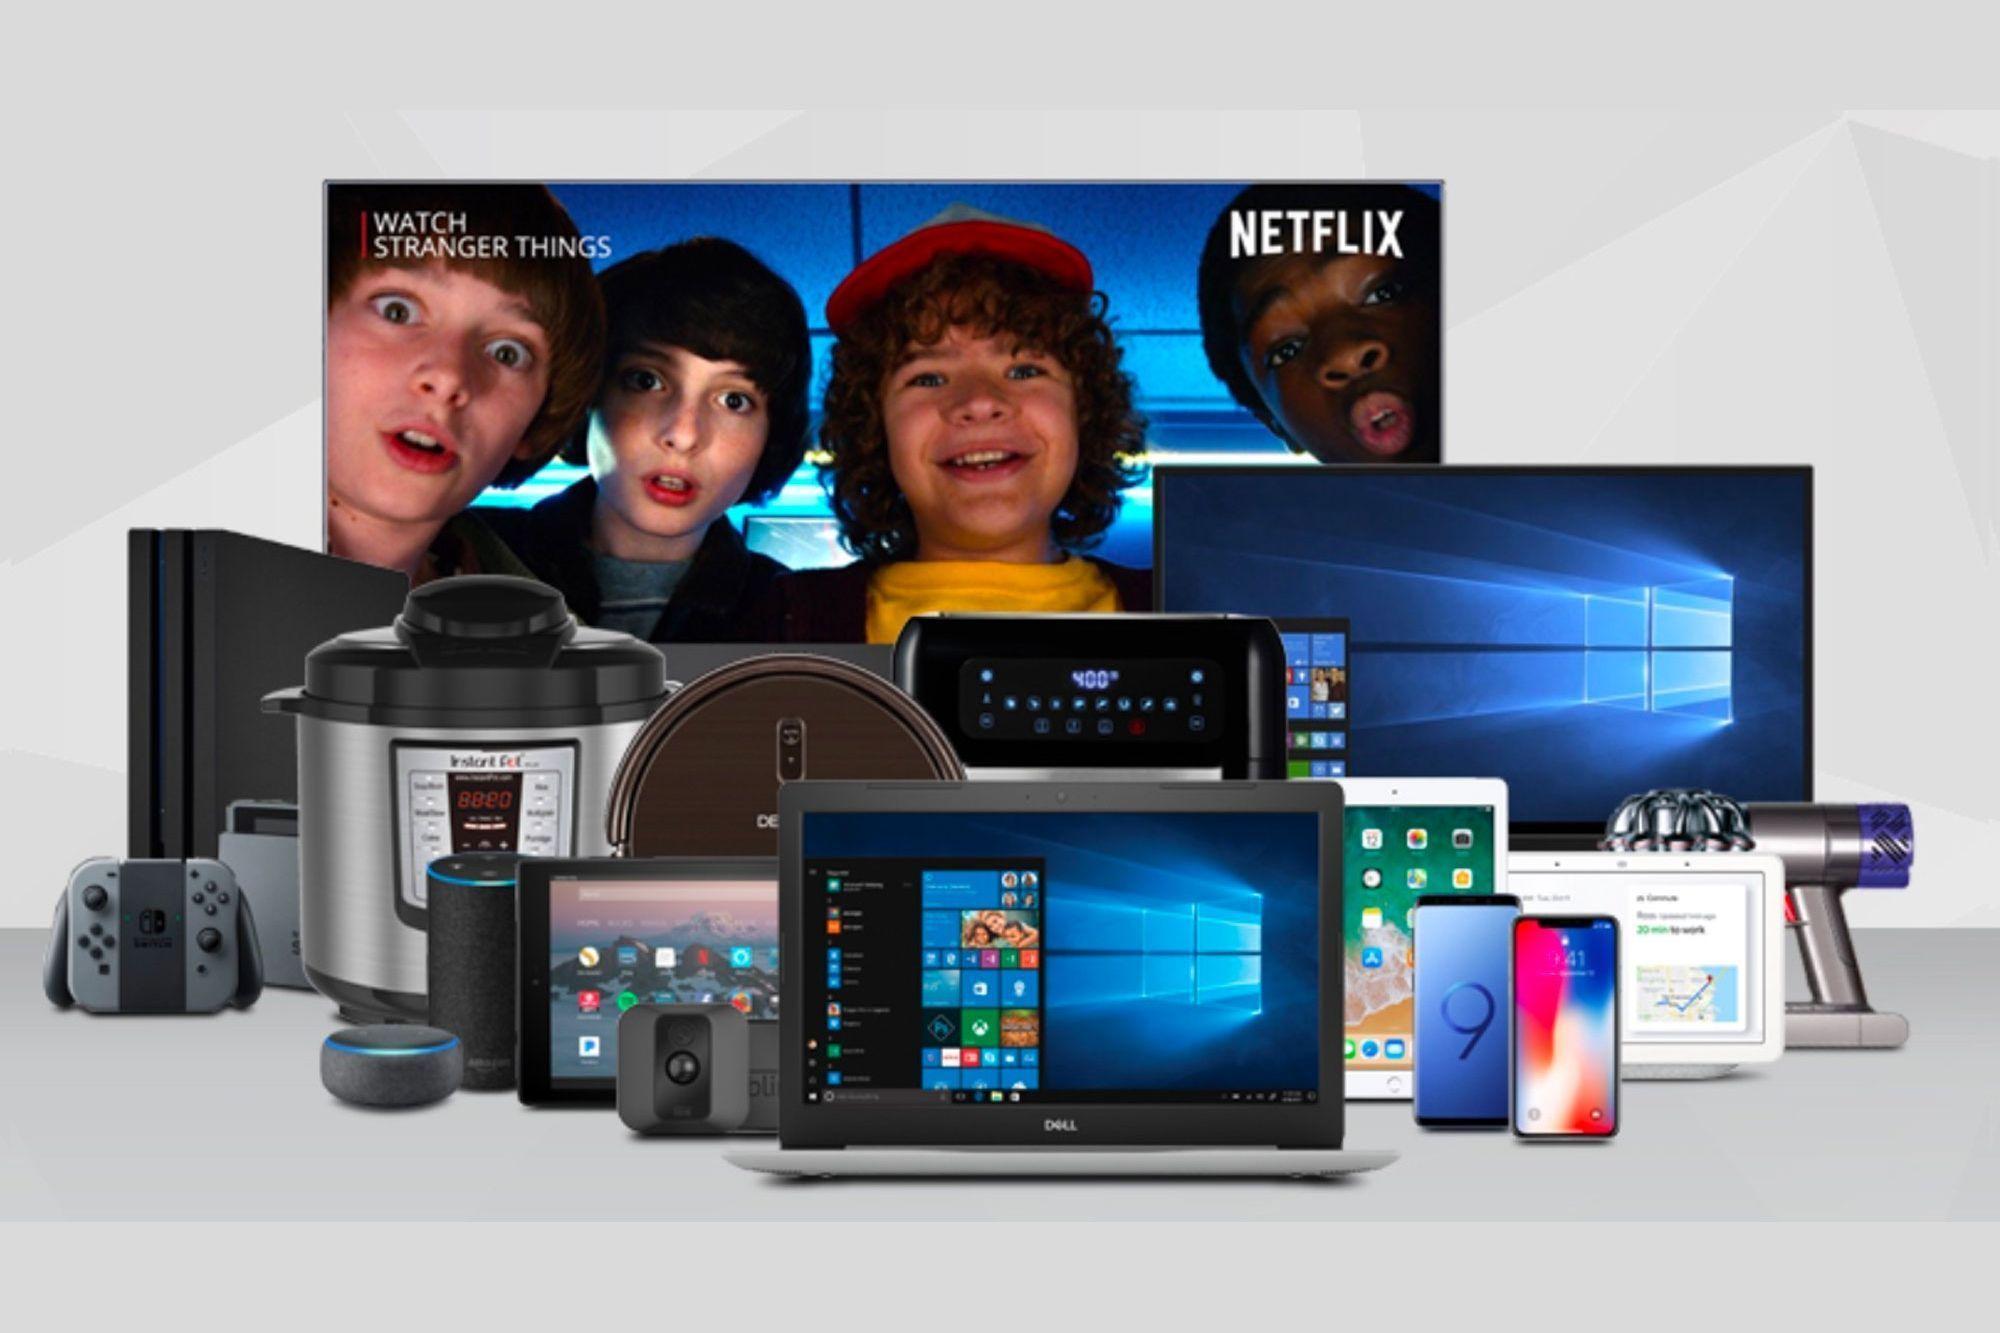 The Best Cyber Monday Tech Deals Ipad Roku 4k Tvs And More Cybermondayhumor The Best Cyber Monday Tech Deals Ipad Roku 4k Tvs And More Cybermondayhumor In 2020 Best Cyber Monday